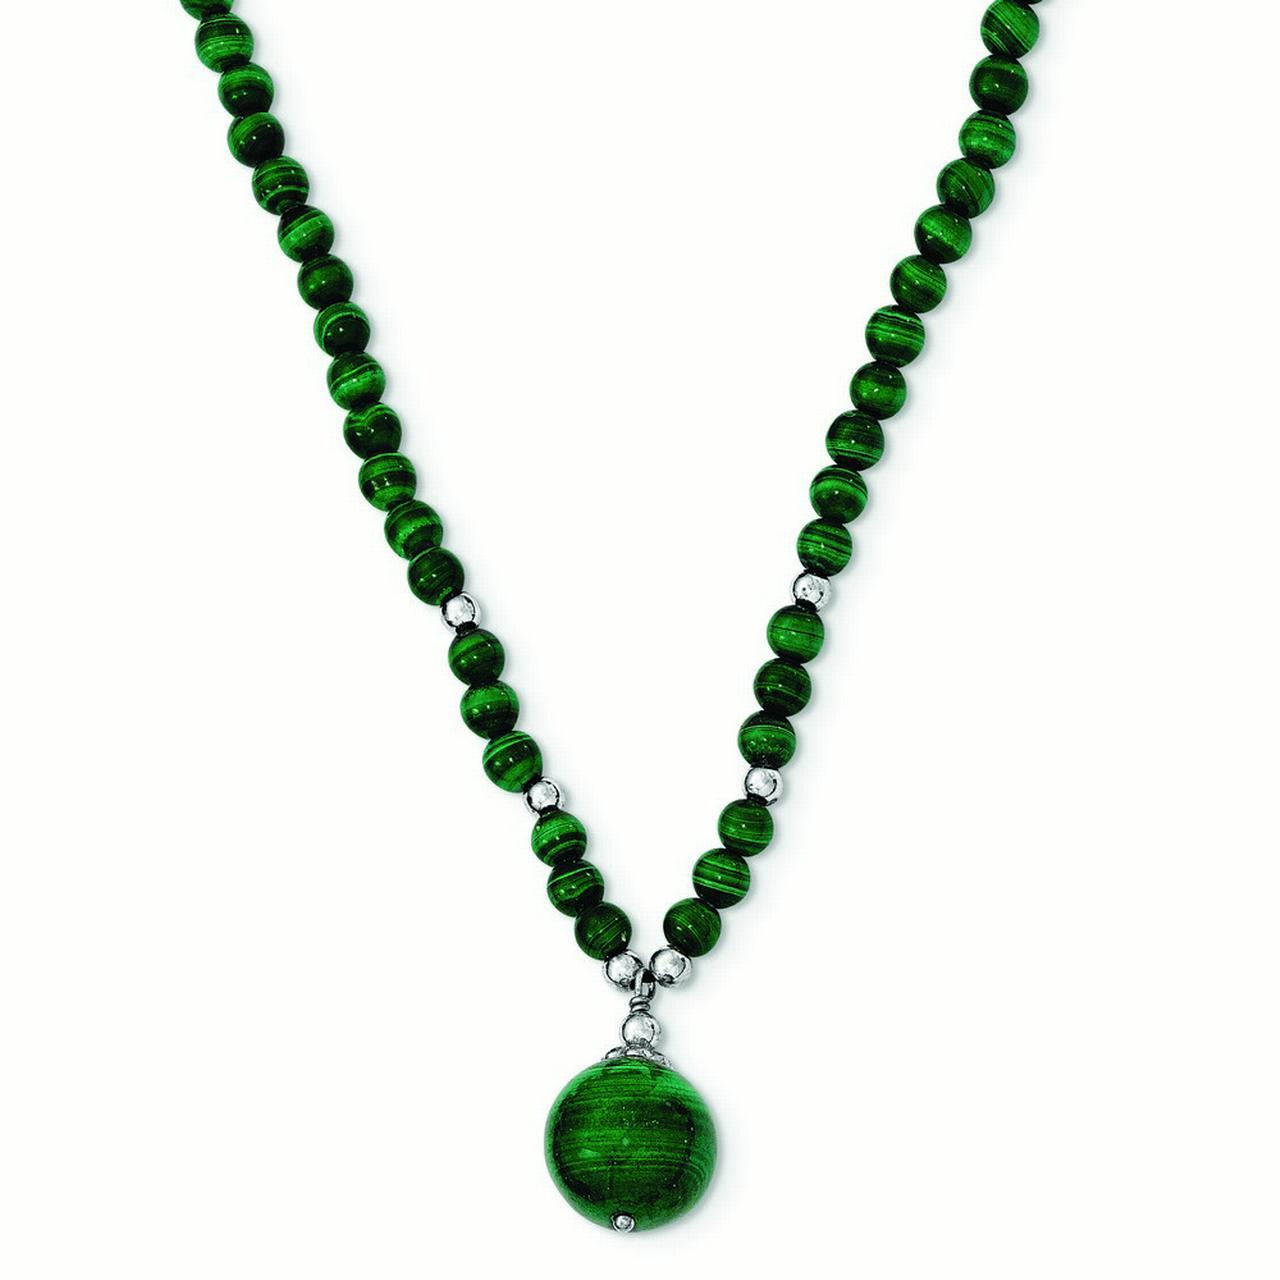 JewelryWeb Sterling Silver Malachite Beaded Necklace - 17...